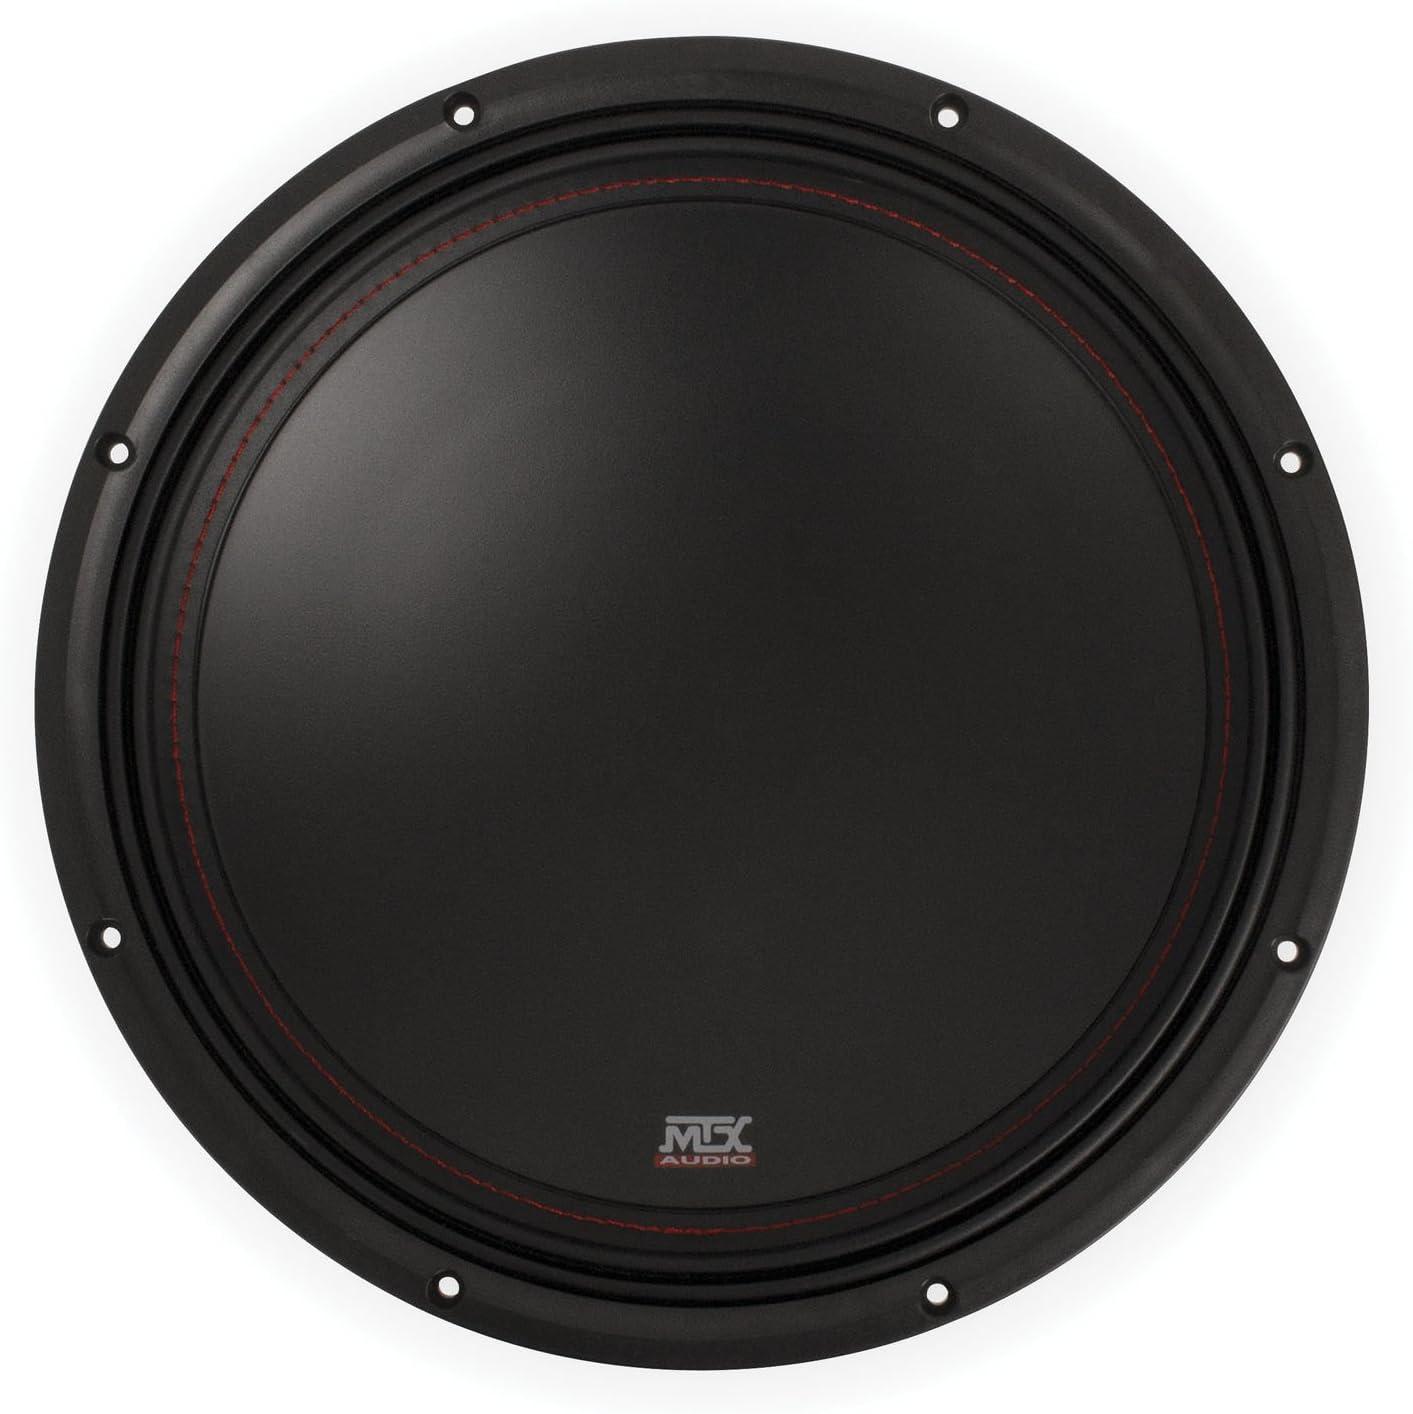 MTX Audio 3512-04 3500 Series Subwoofer